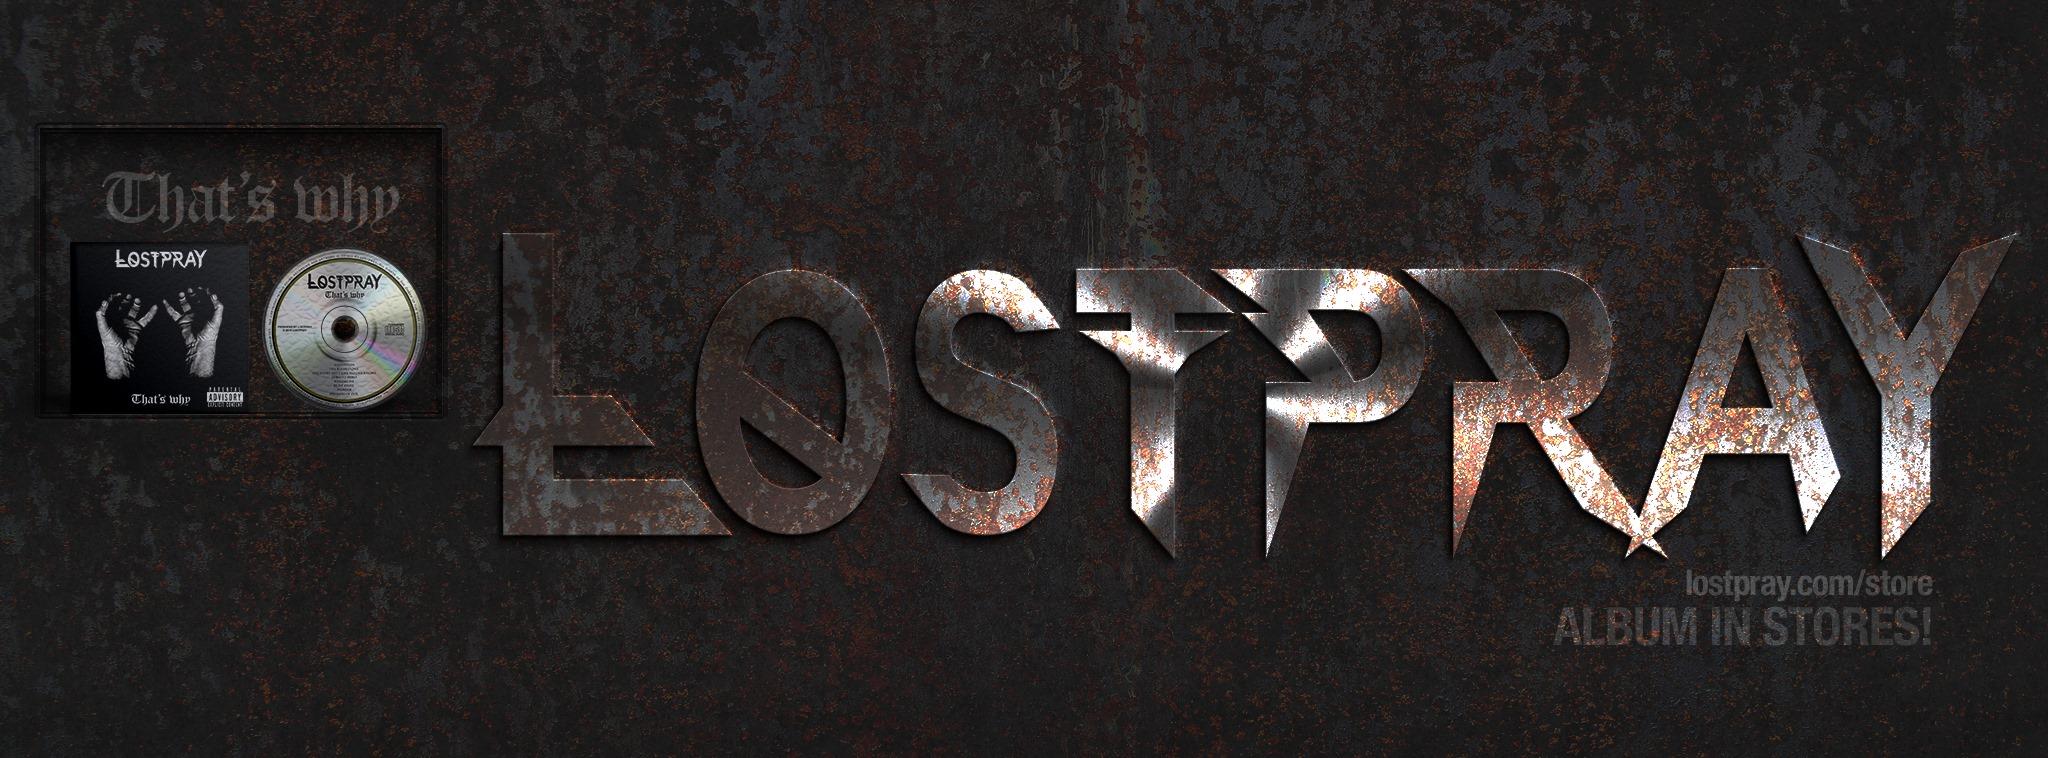 lost pray